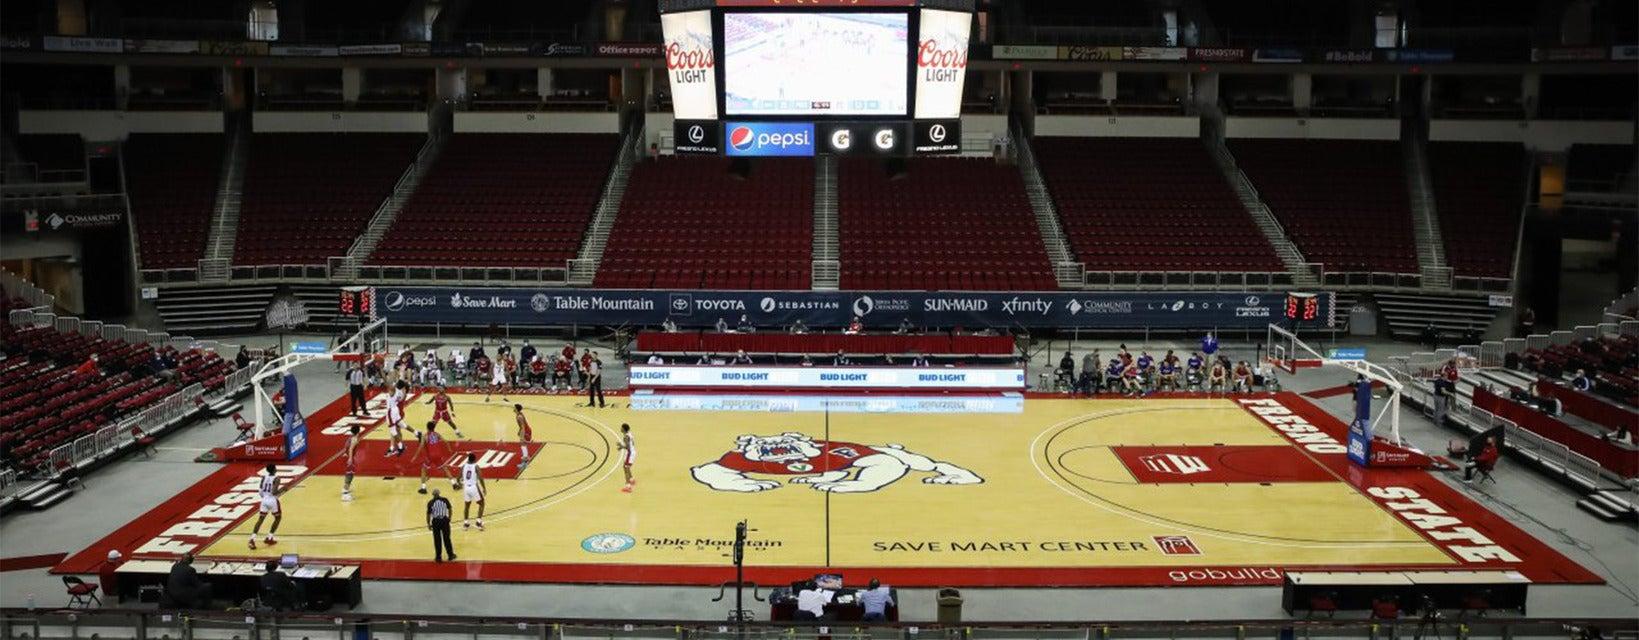 Fresno State Basketball Tickets